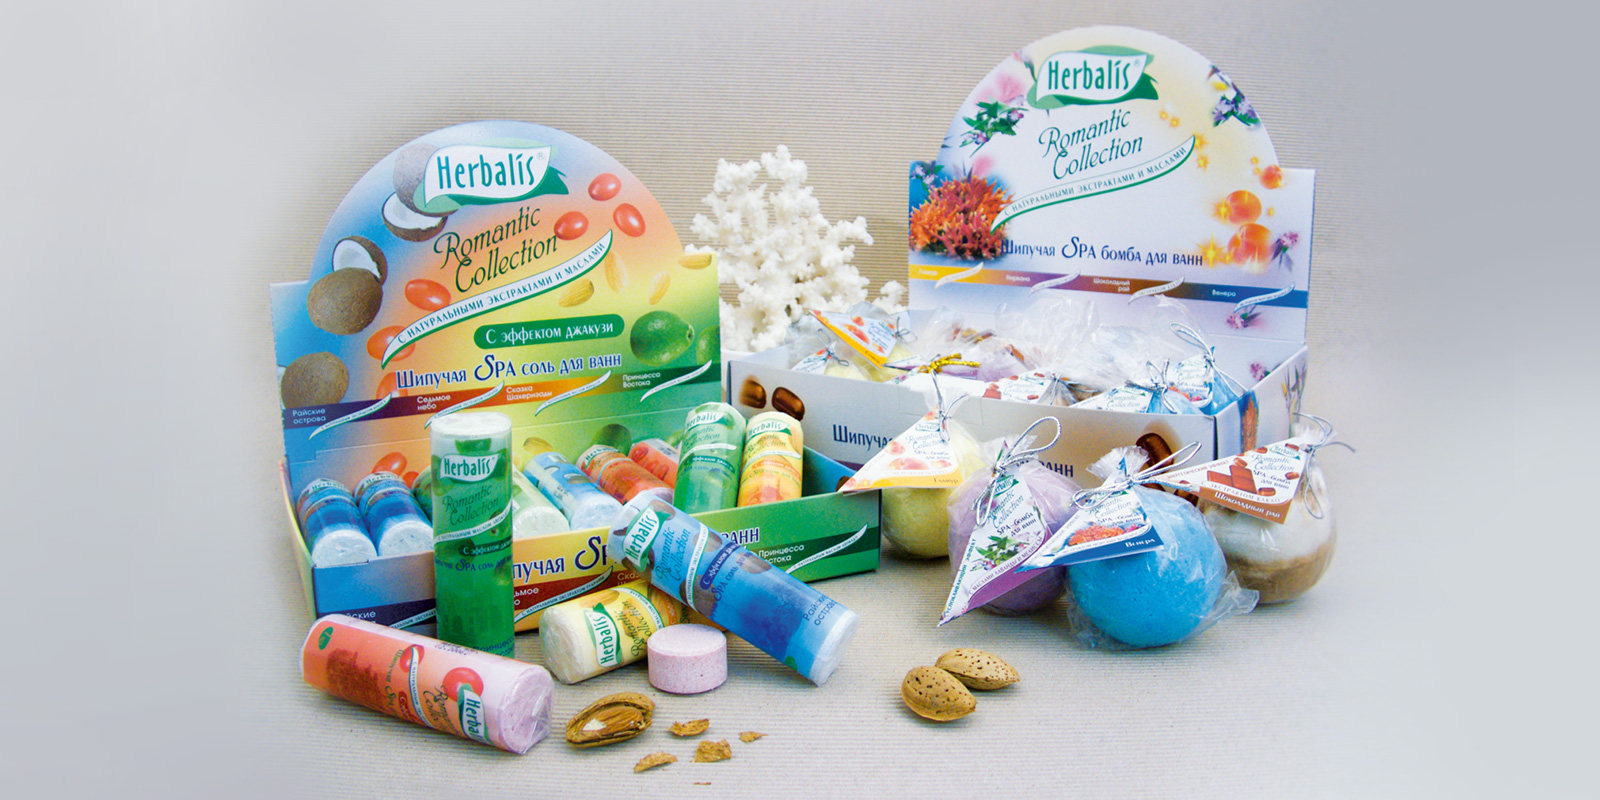 TM «Herbalis»;;;;;;Разработка упаковки ( средство по уходу за телом) ;;;;;;<span>Клиент:</span> Компания «Авито Brand Company»;;;;;;;;;;;;Разработка упаковки ( средство по уходу за телом) ;;;;;;2